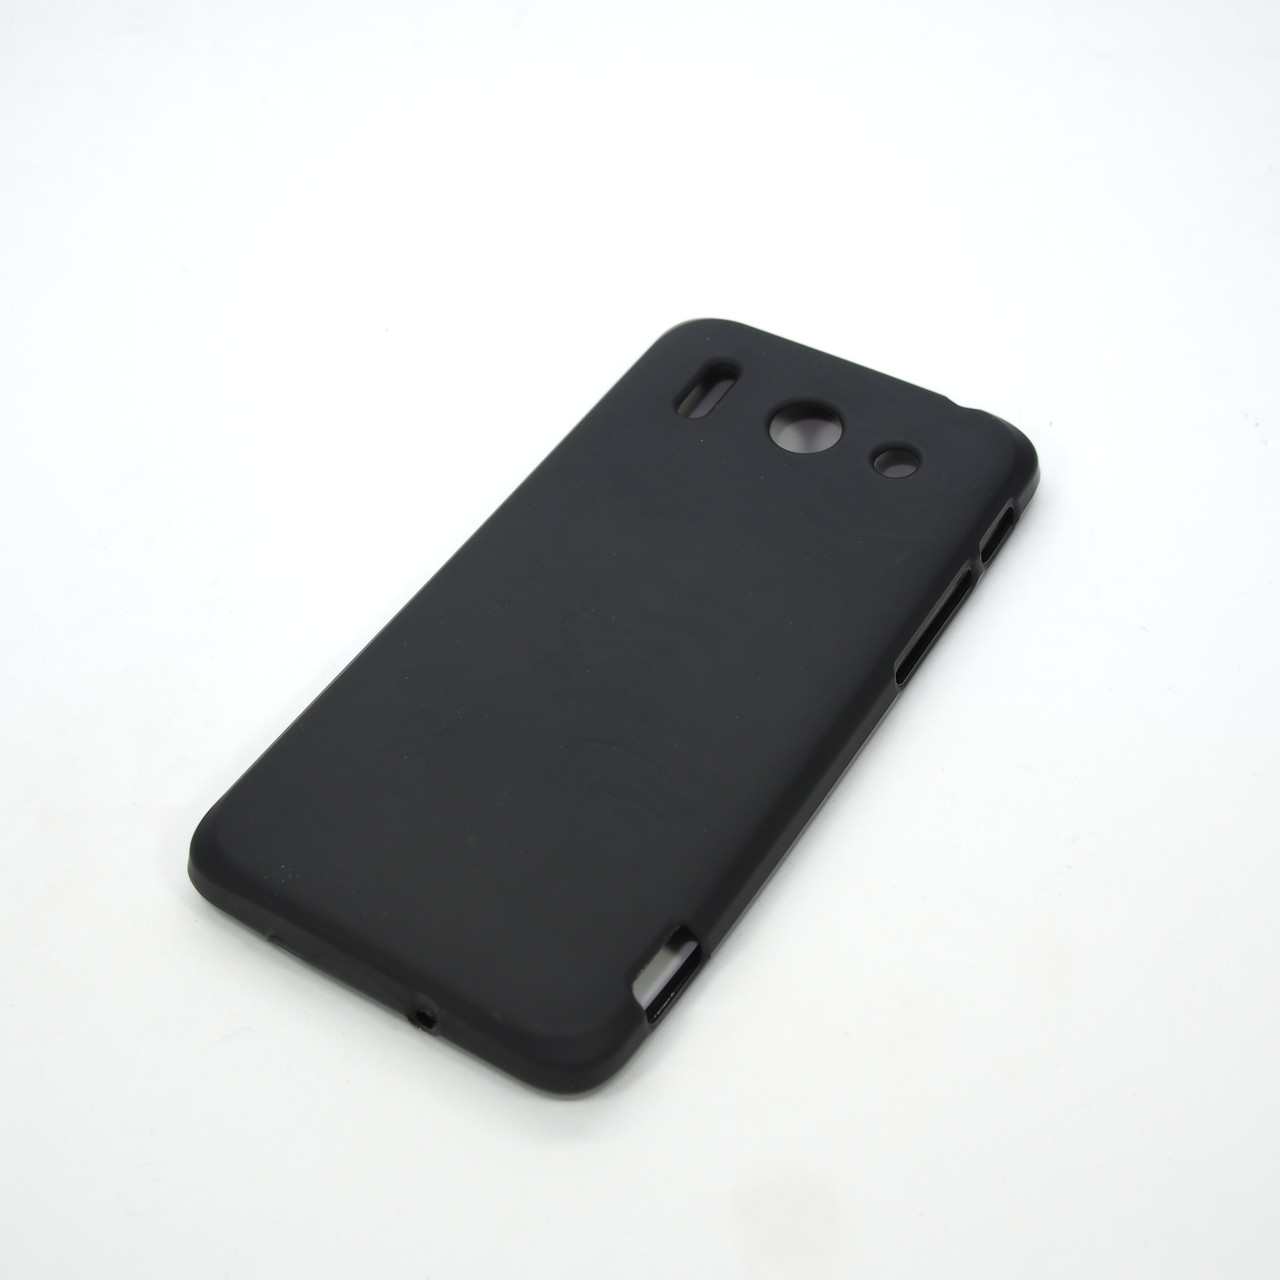 Чехол TPU Huawei Ascend G510 U8951 black Для телефона